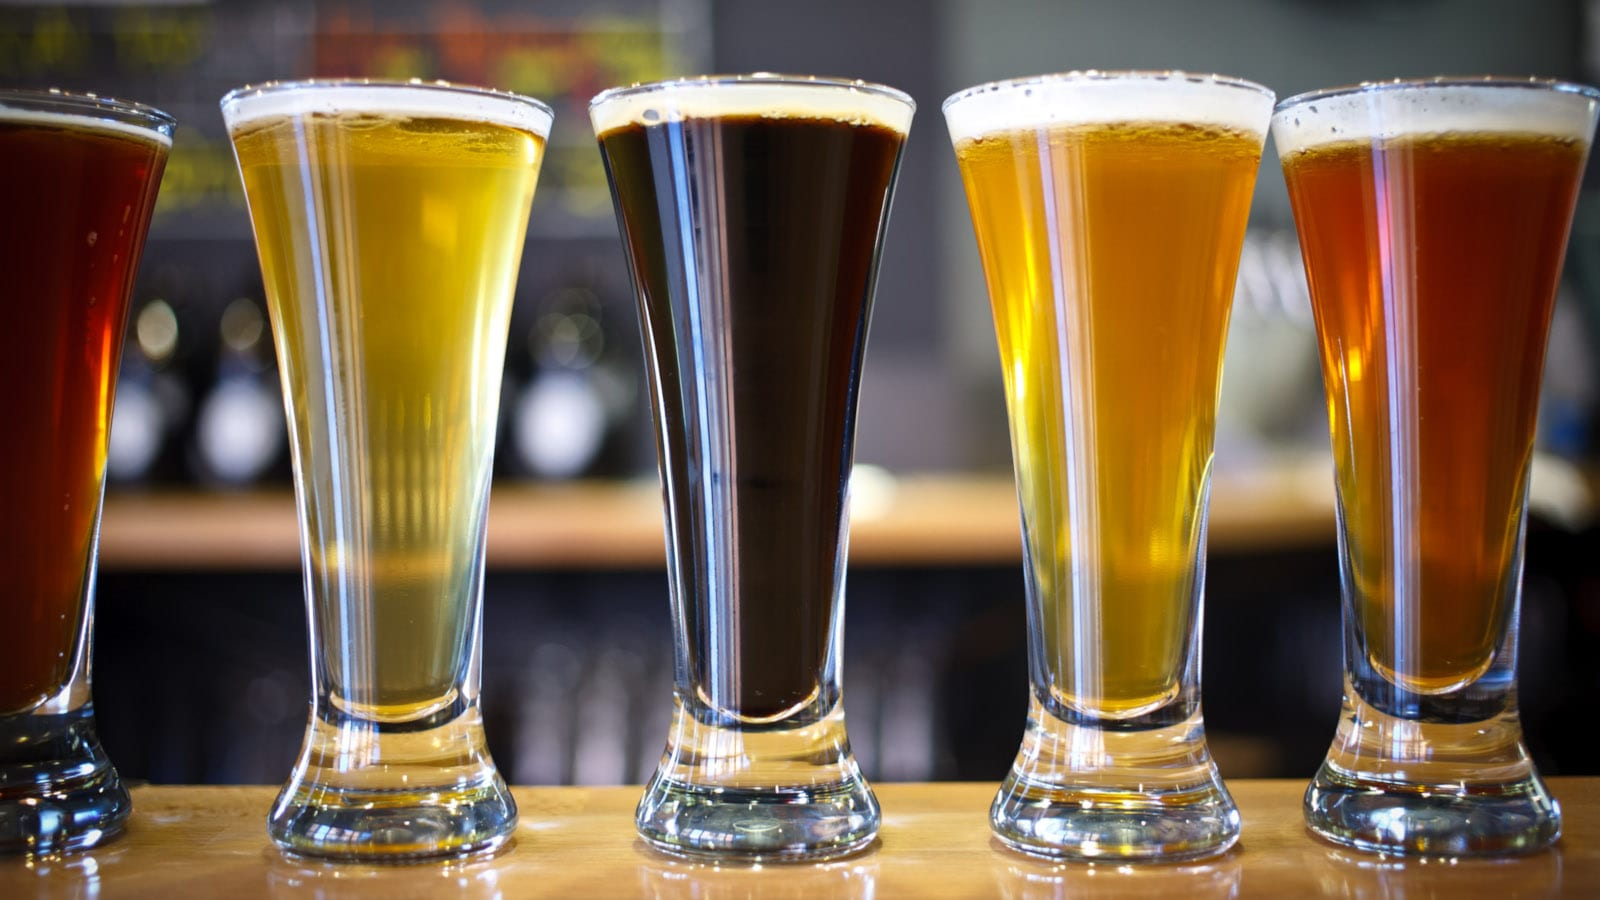 Denver Travel Destination River North Brewery Beer Flight